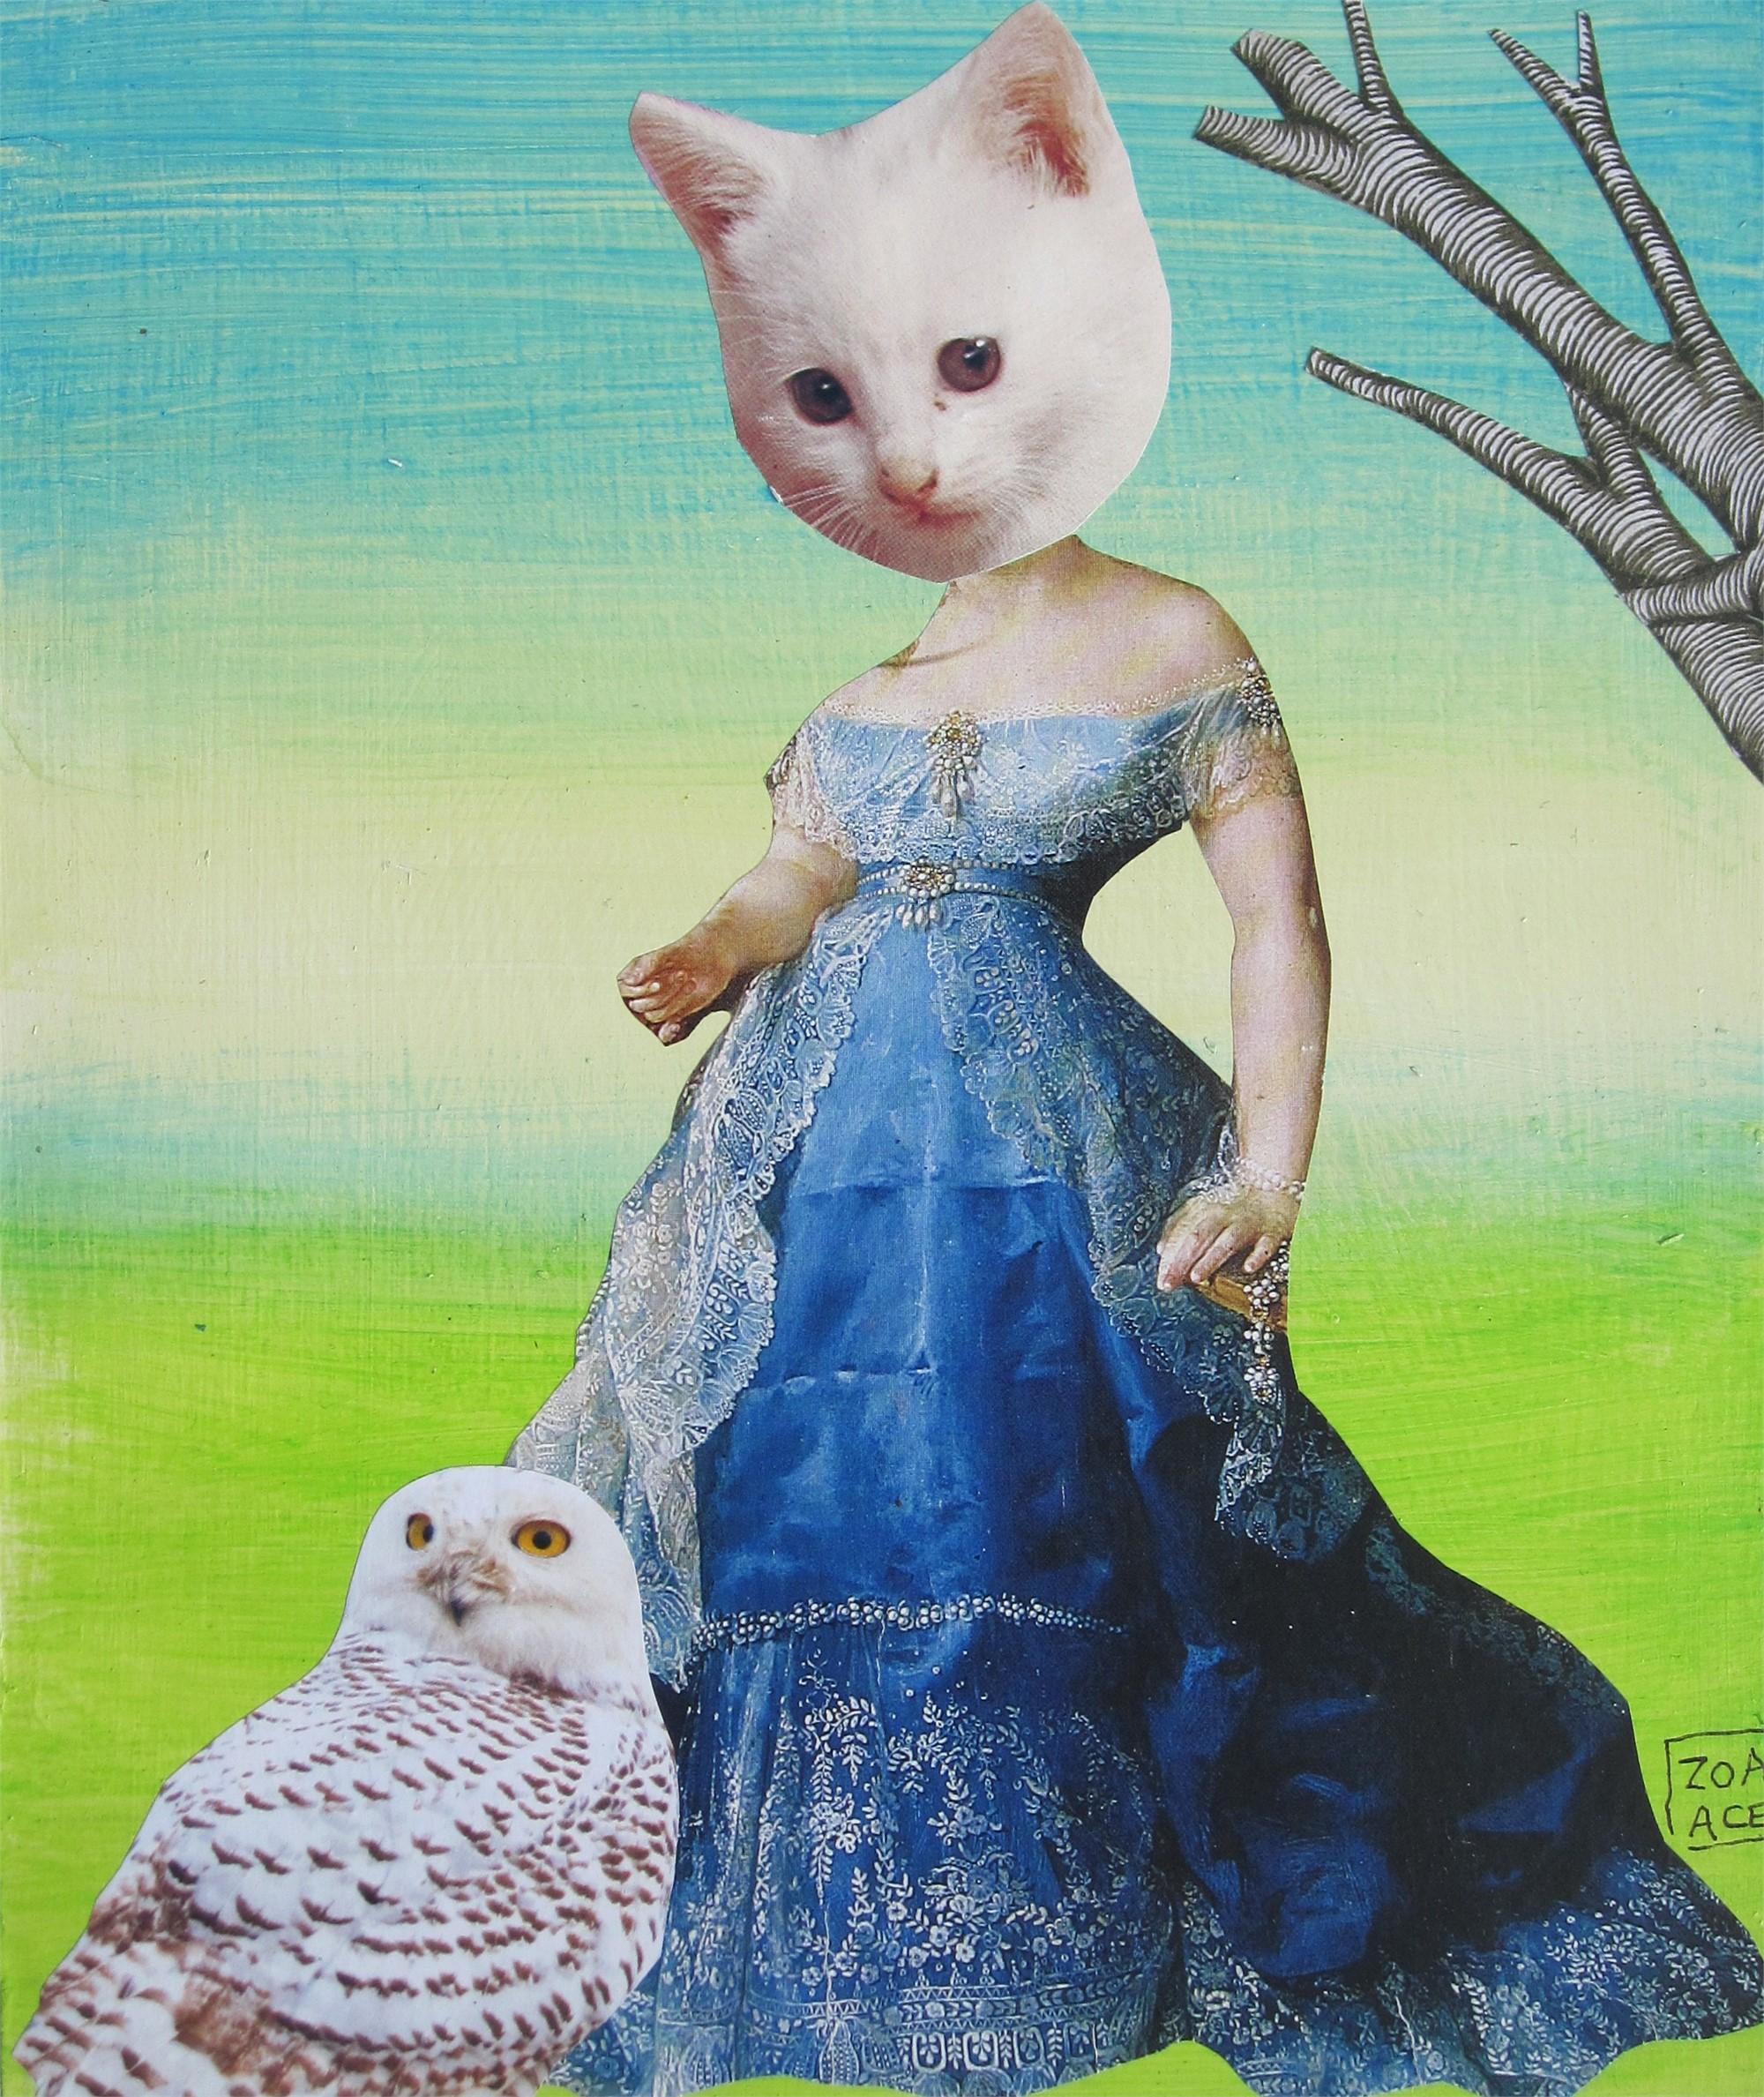 Bird Watcher by Zoa Ace